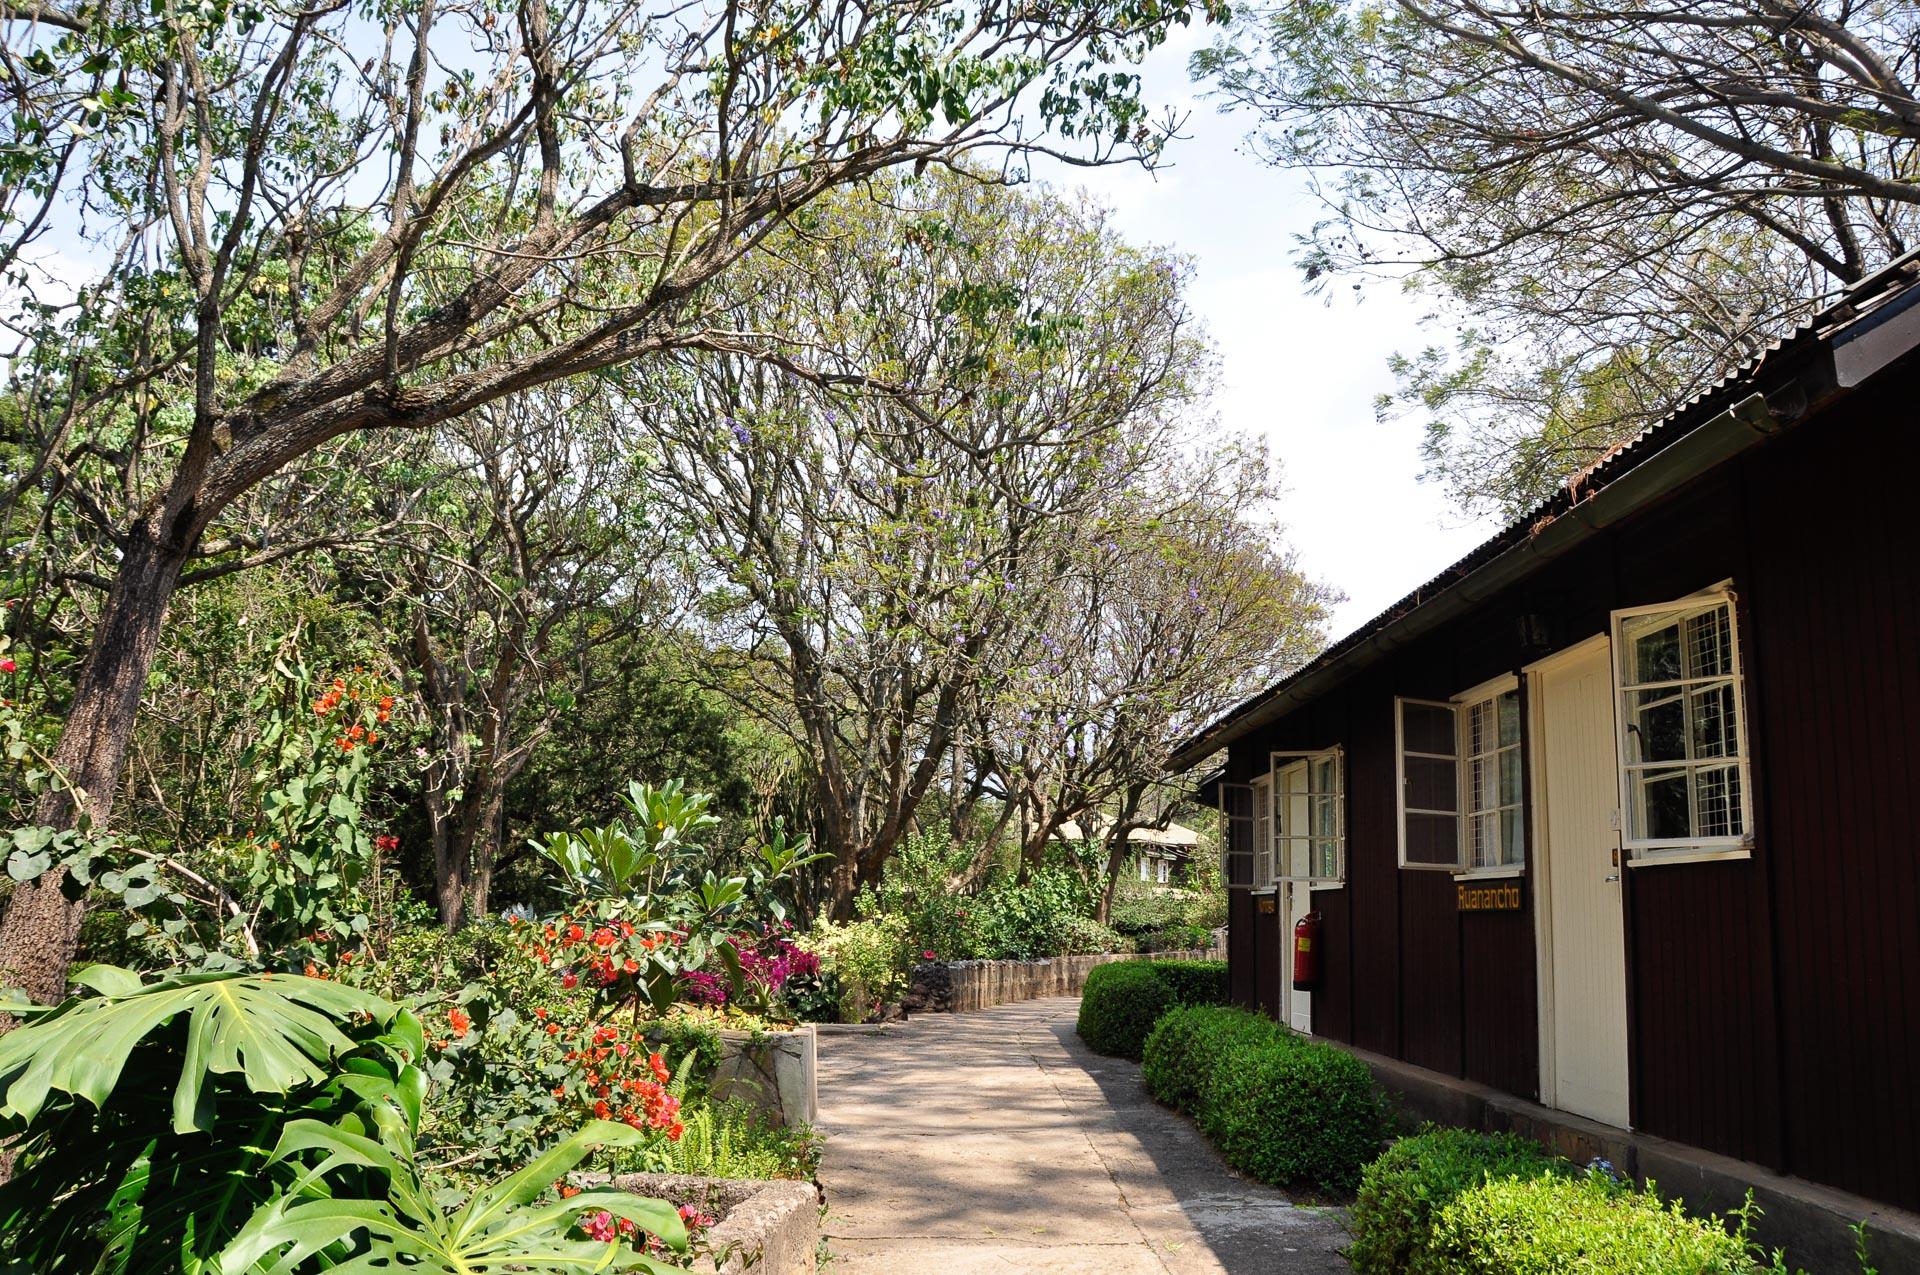 Naro-Moru-River-Lodge-Kenia-Globetrotter-Select-7